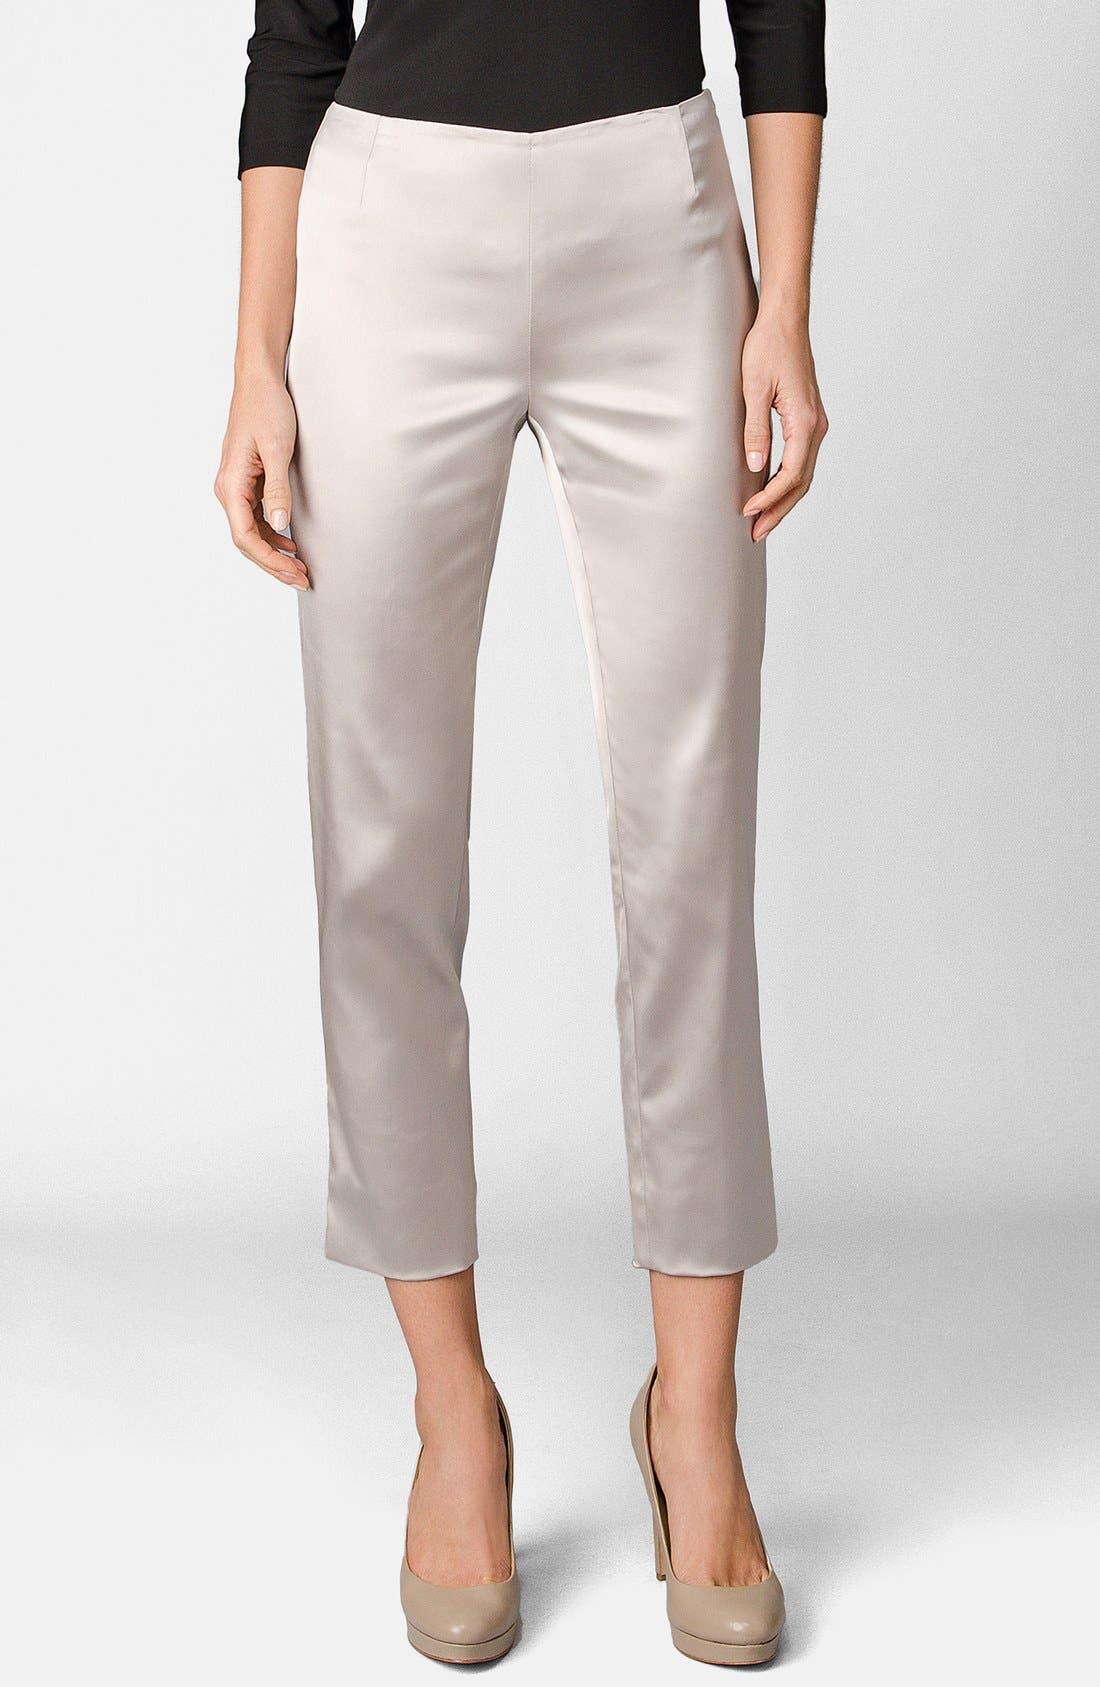 Main Image - Lafayette 148 New York 'Stanton - Belle Satin' Pants